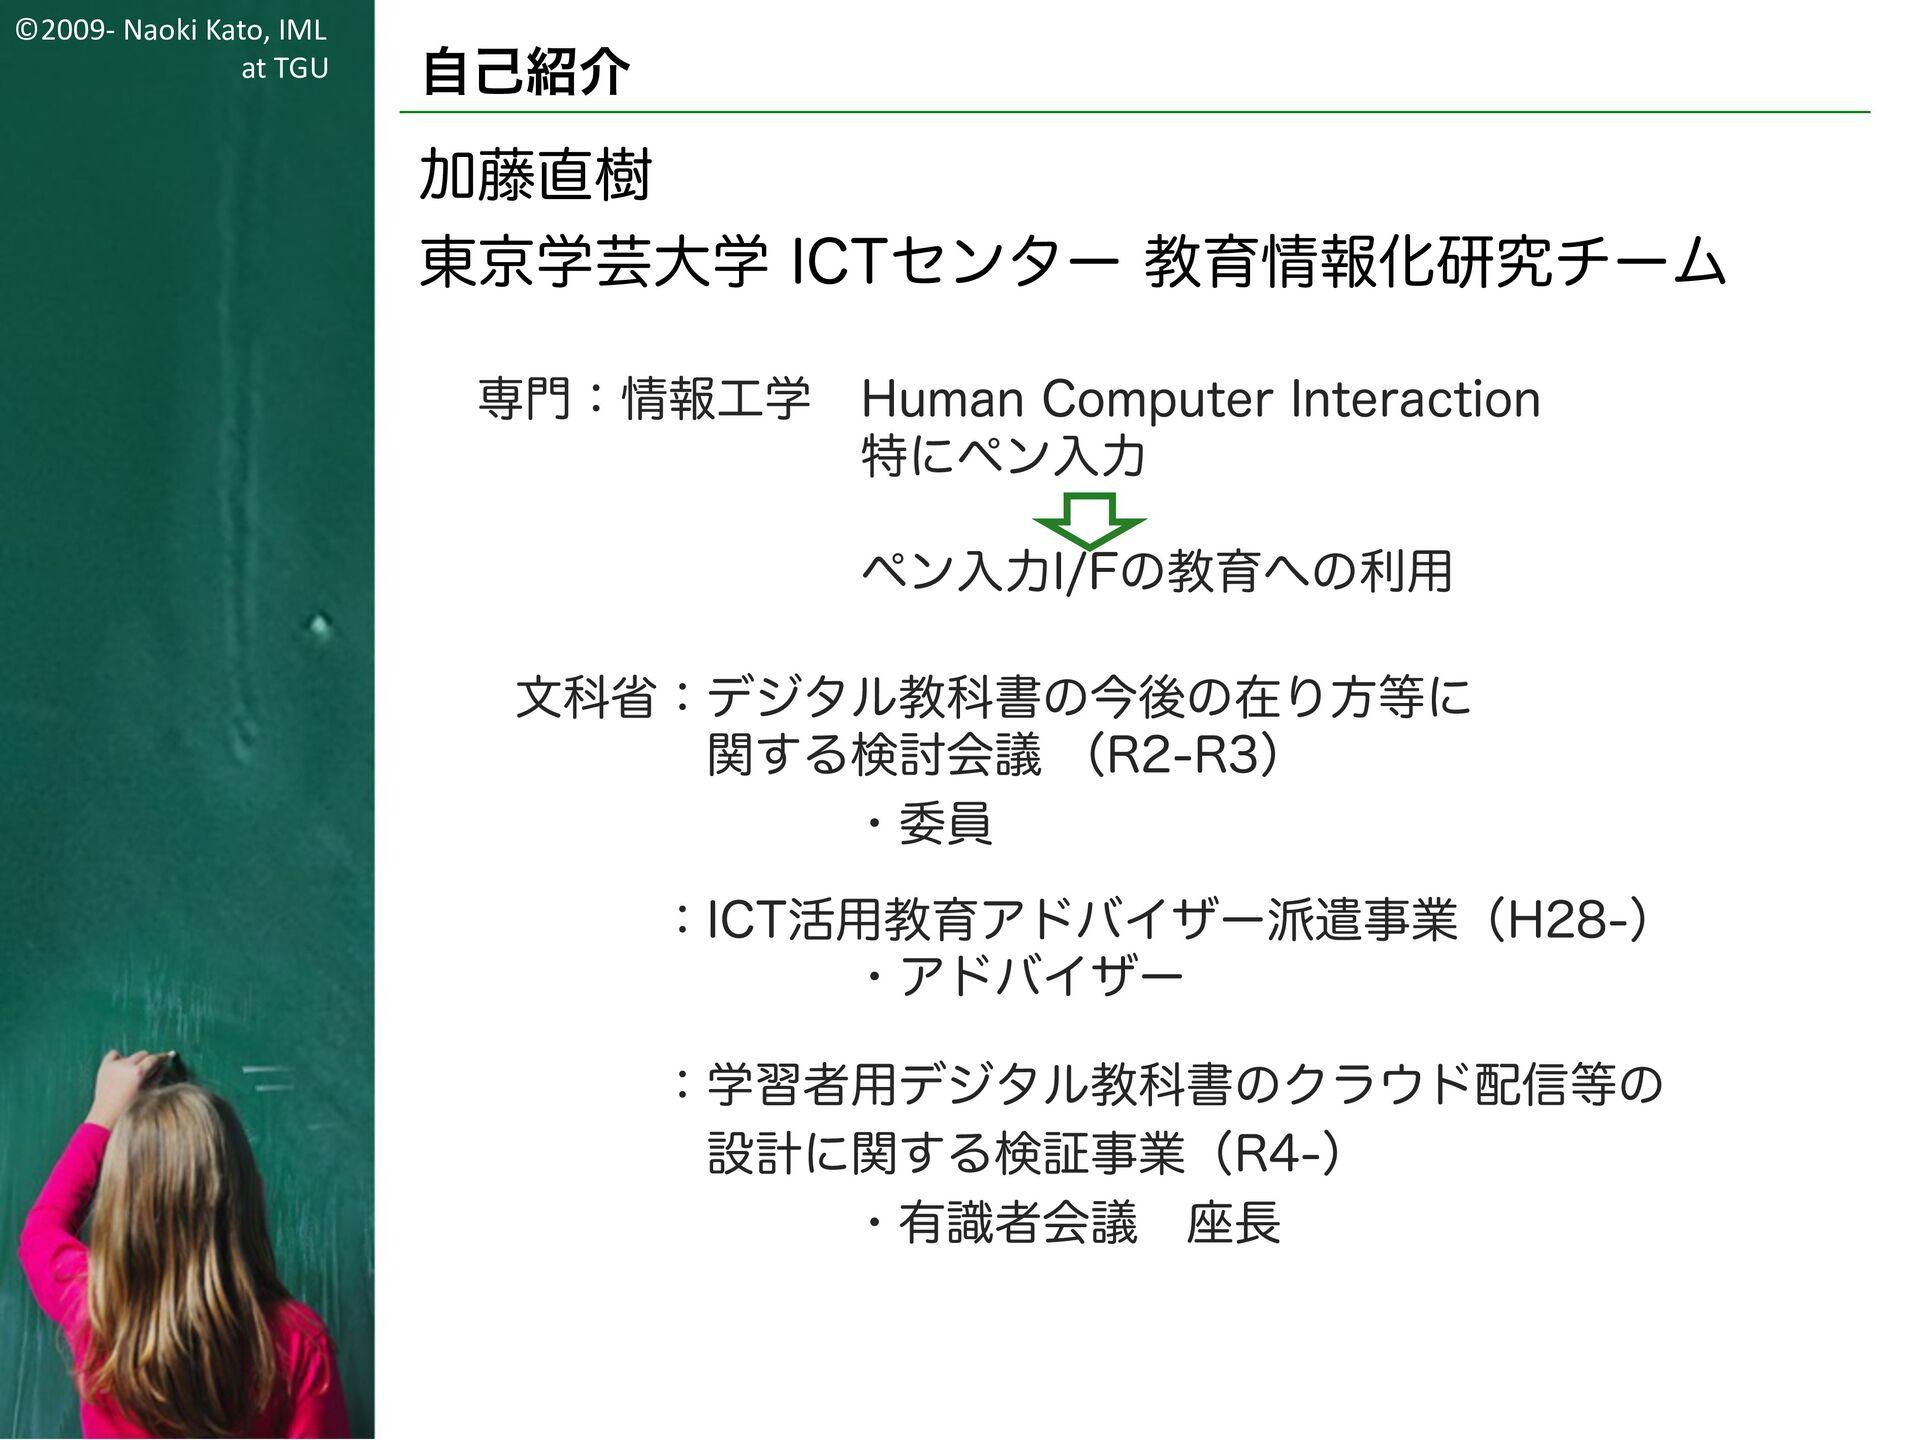 ©2009- Naoki Kato, IML at TGU 自己紹介 加藤直樹 東京学芸大学 ...